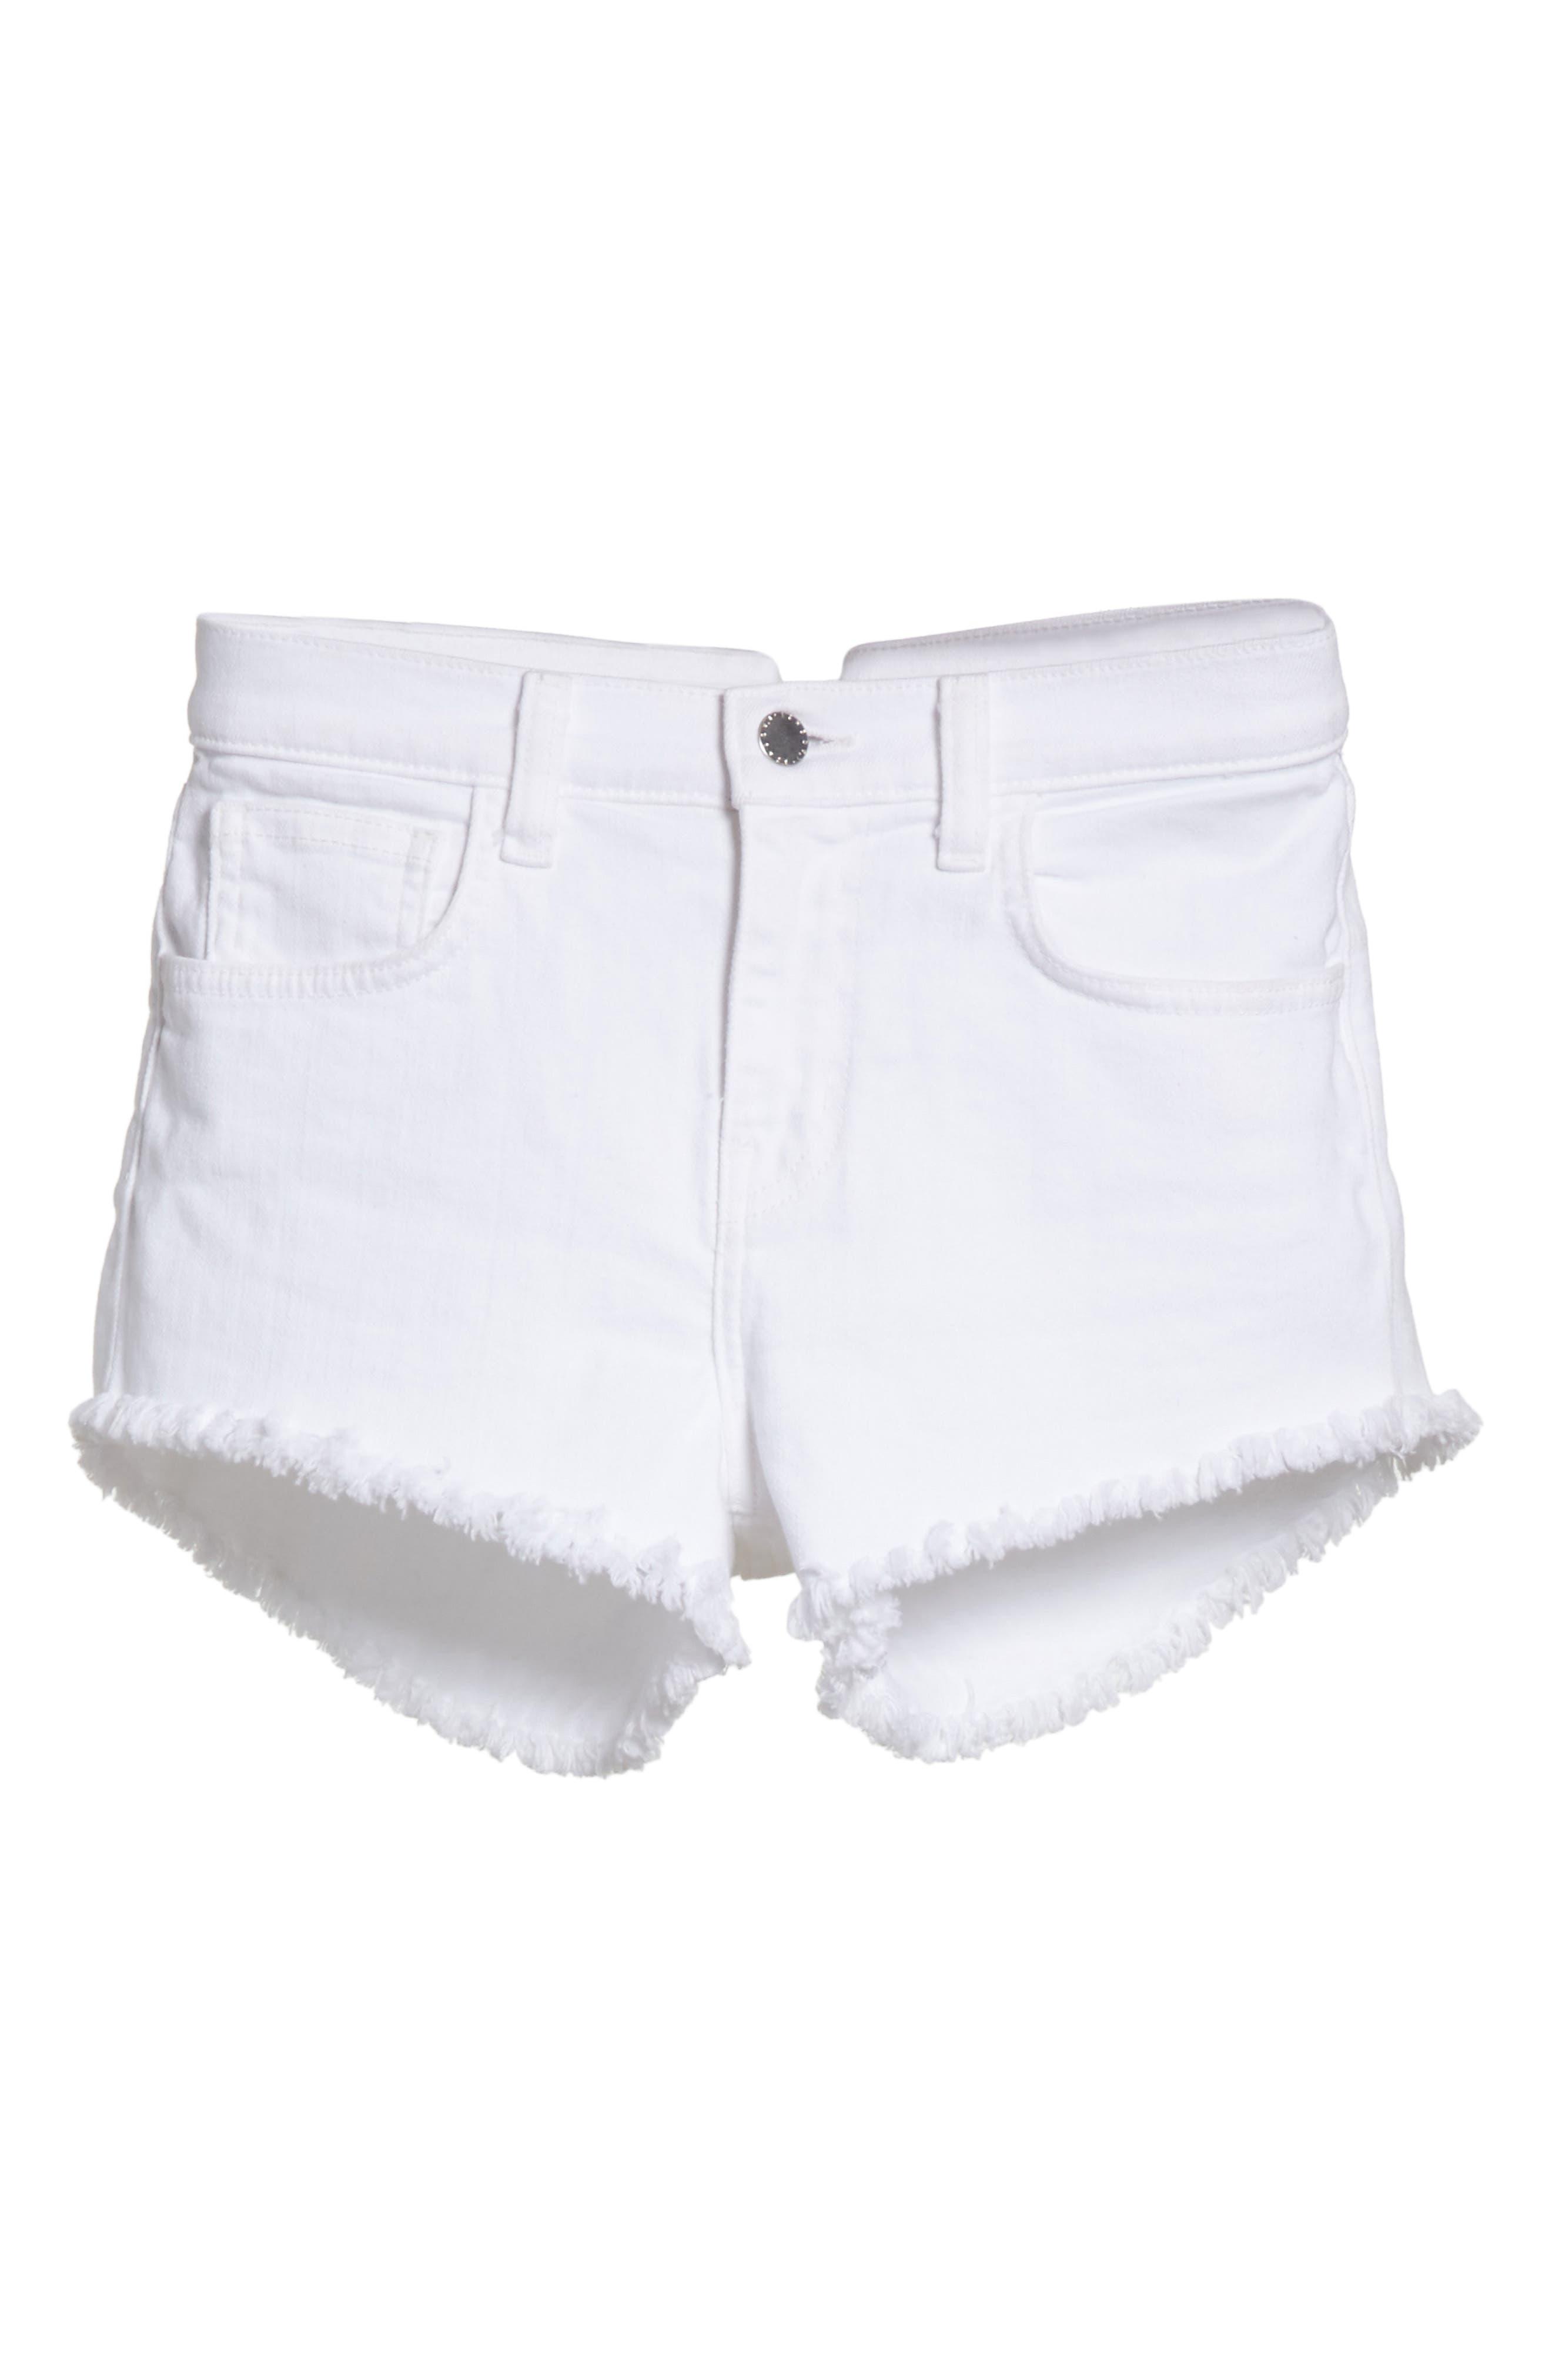 Zoe Cutoff Denim Shorts,                             Alternate thumbnail 6, color,                             100